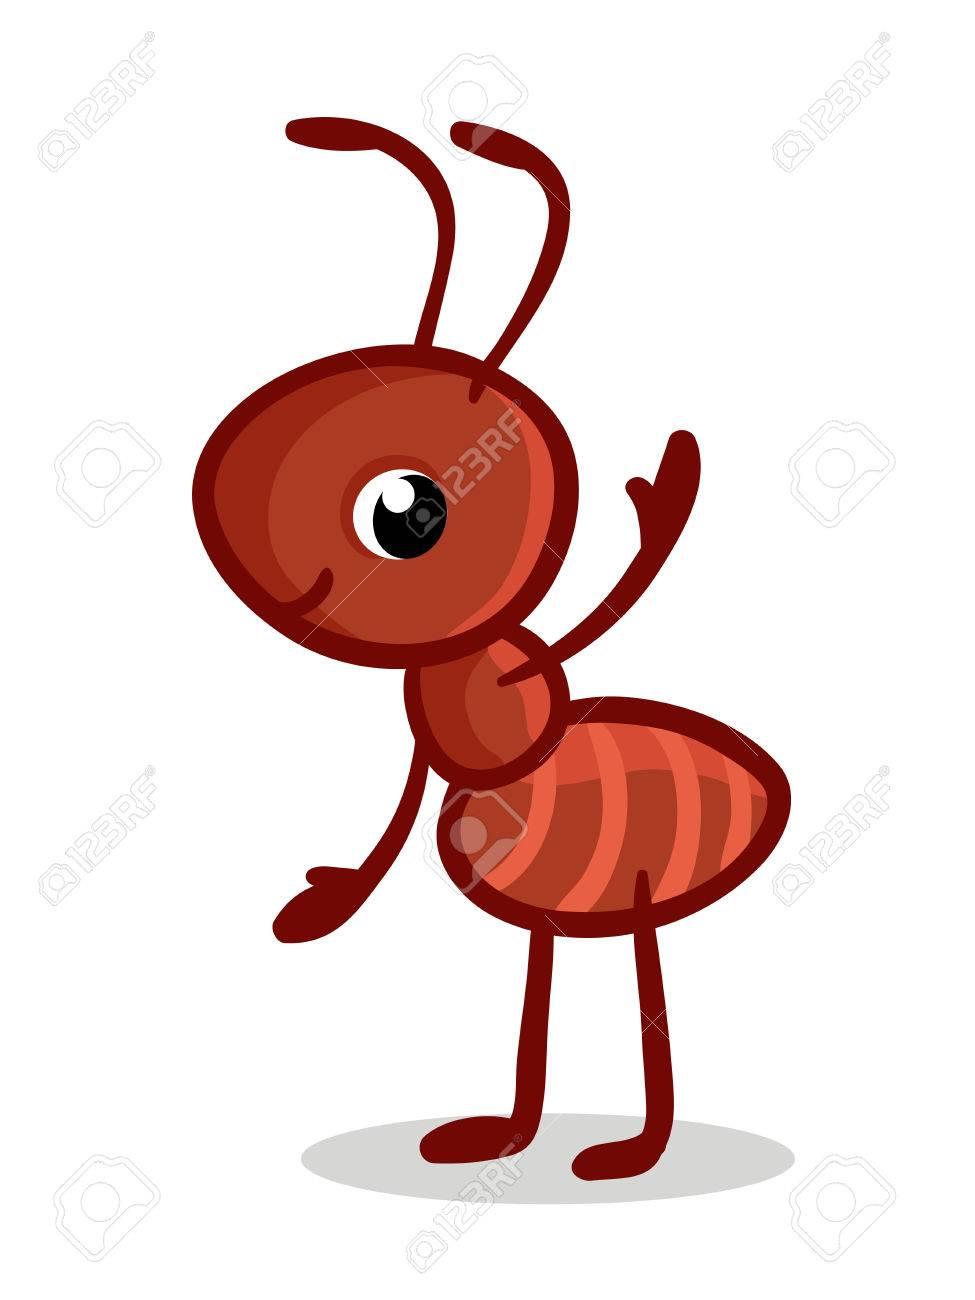 975x1300 Ants Clipart Children'S